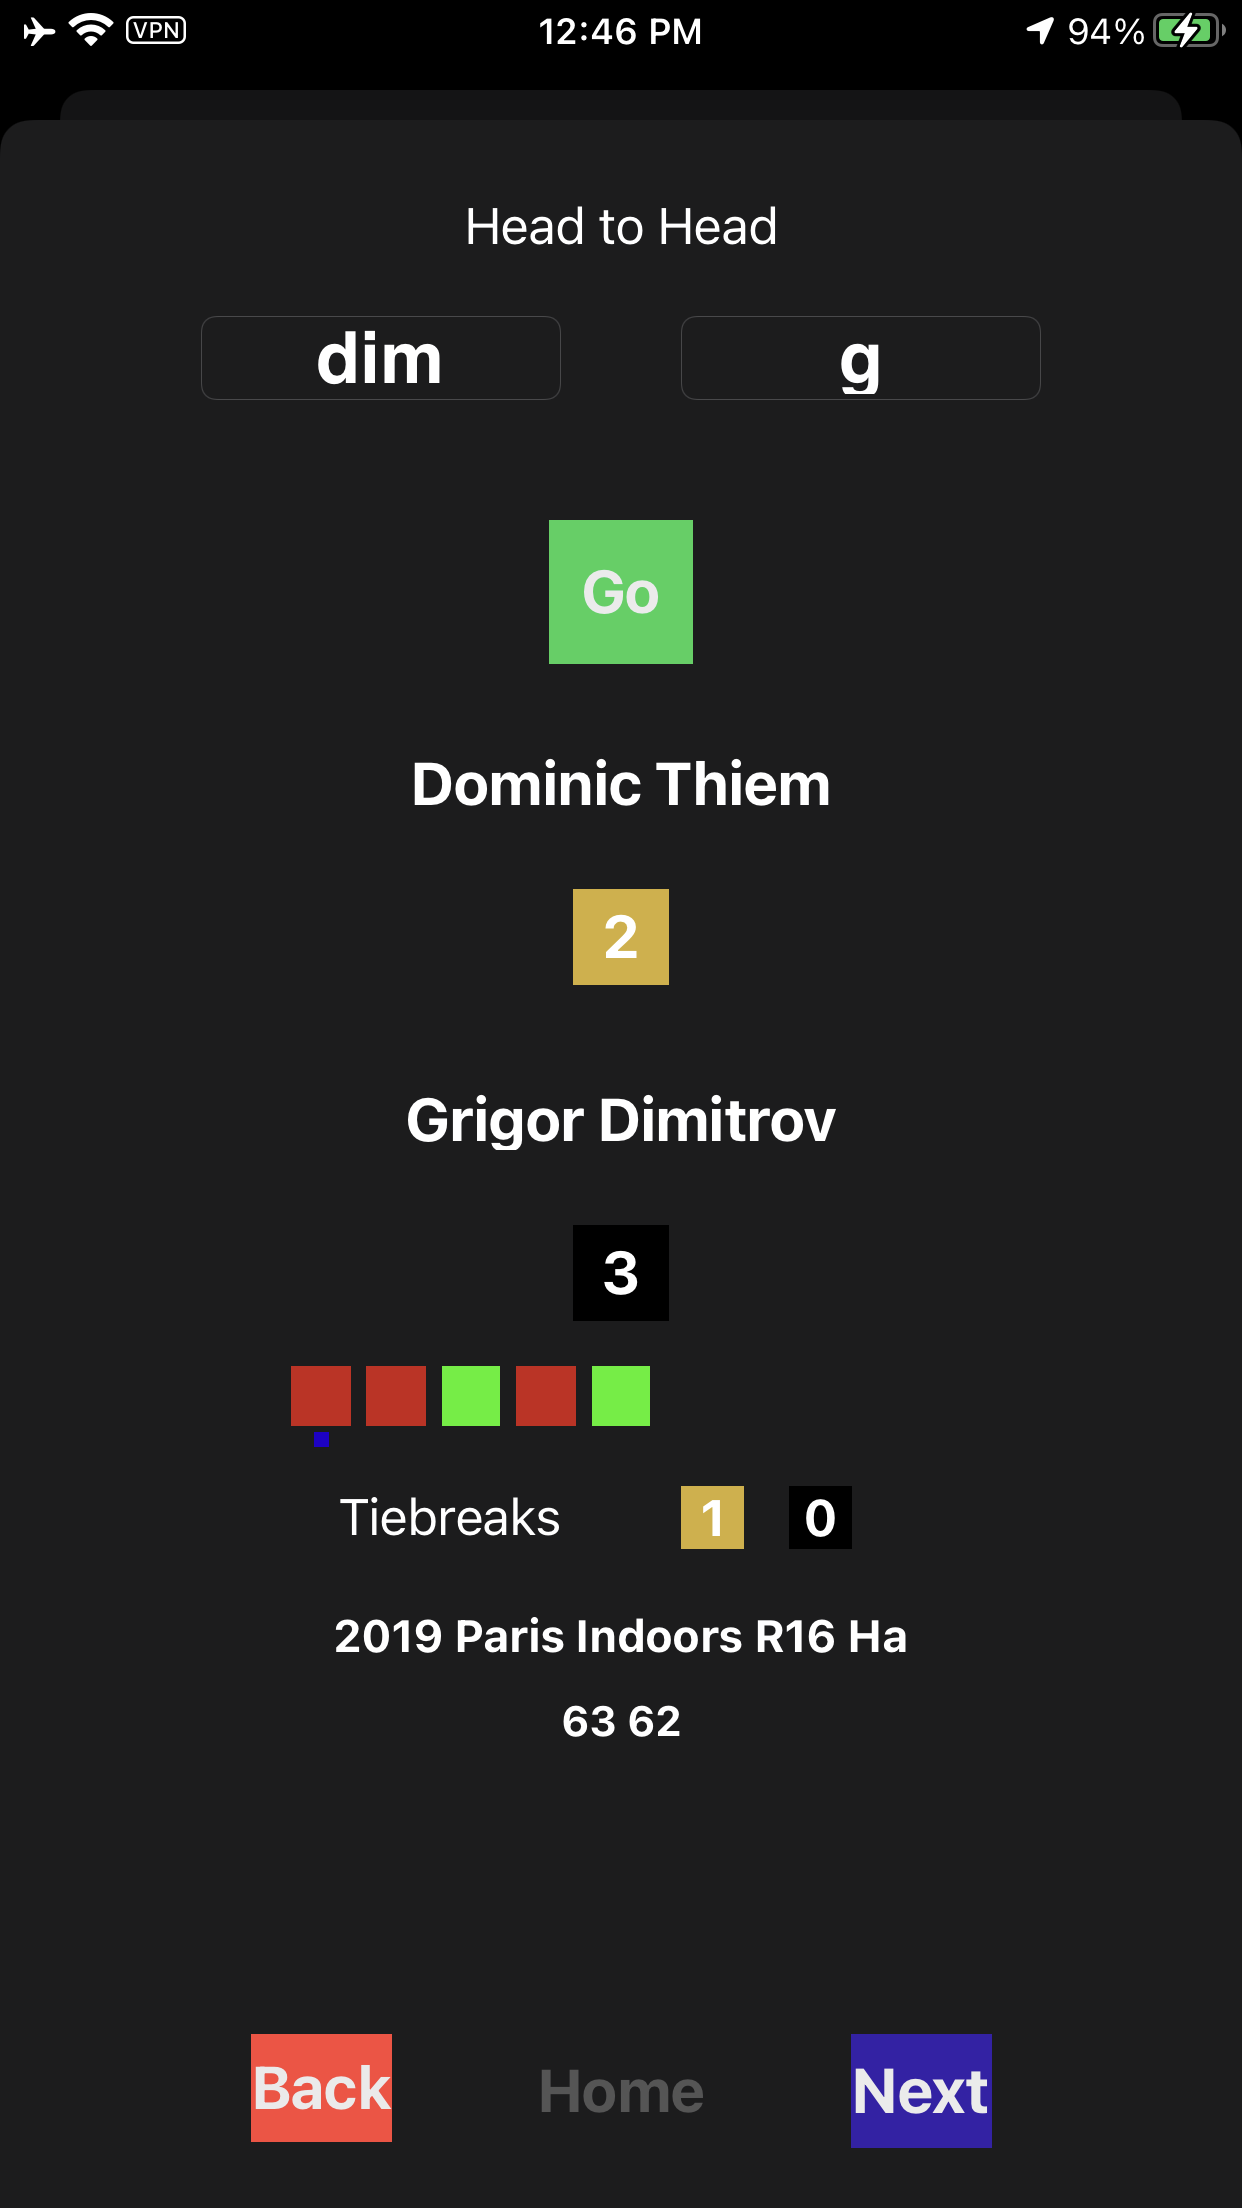 The tennisdata App Continues to Improve